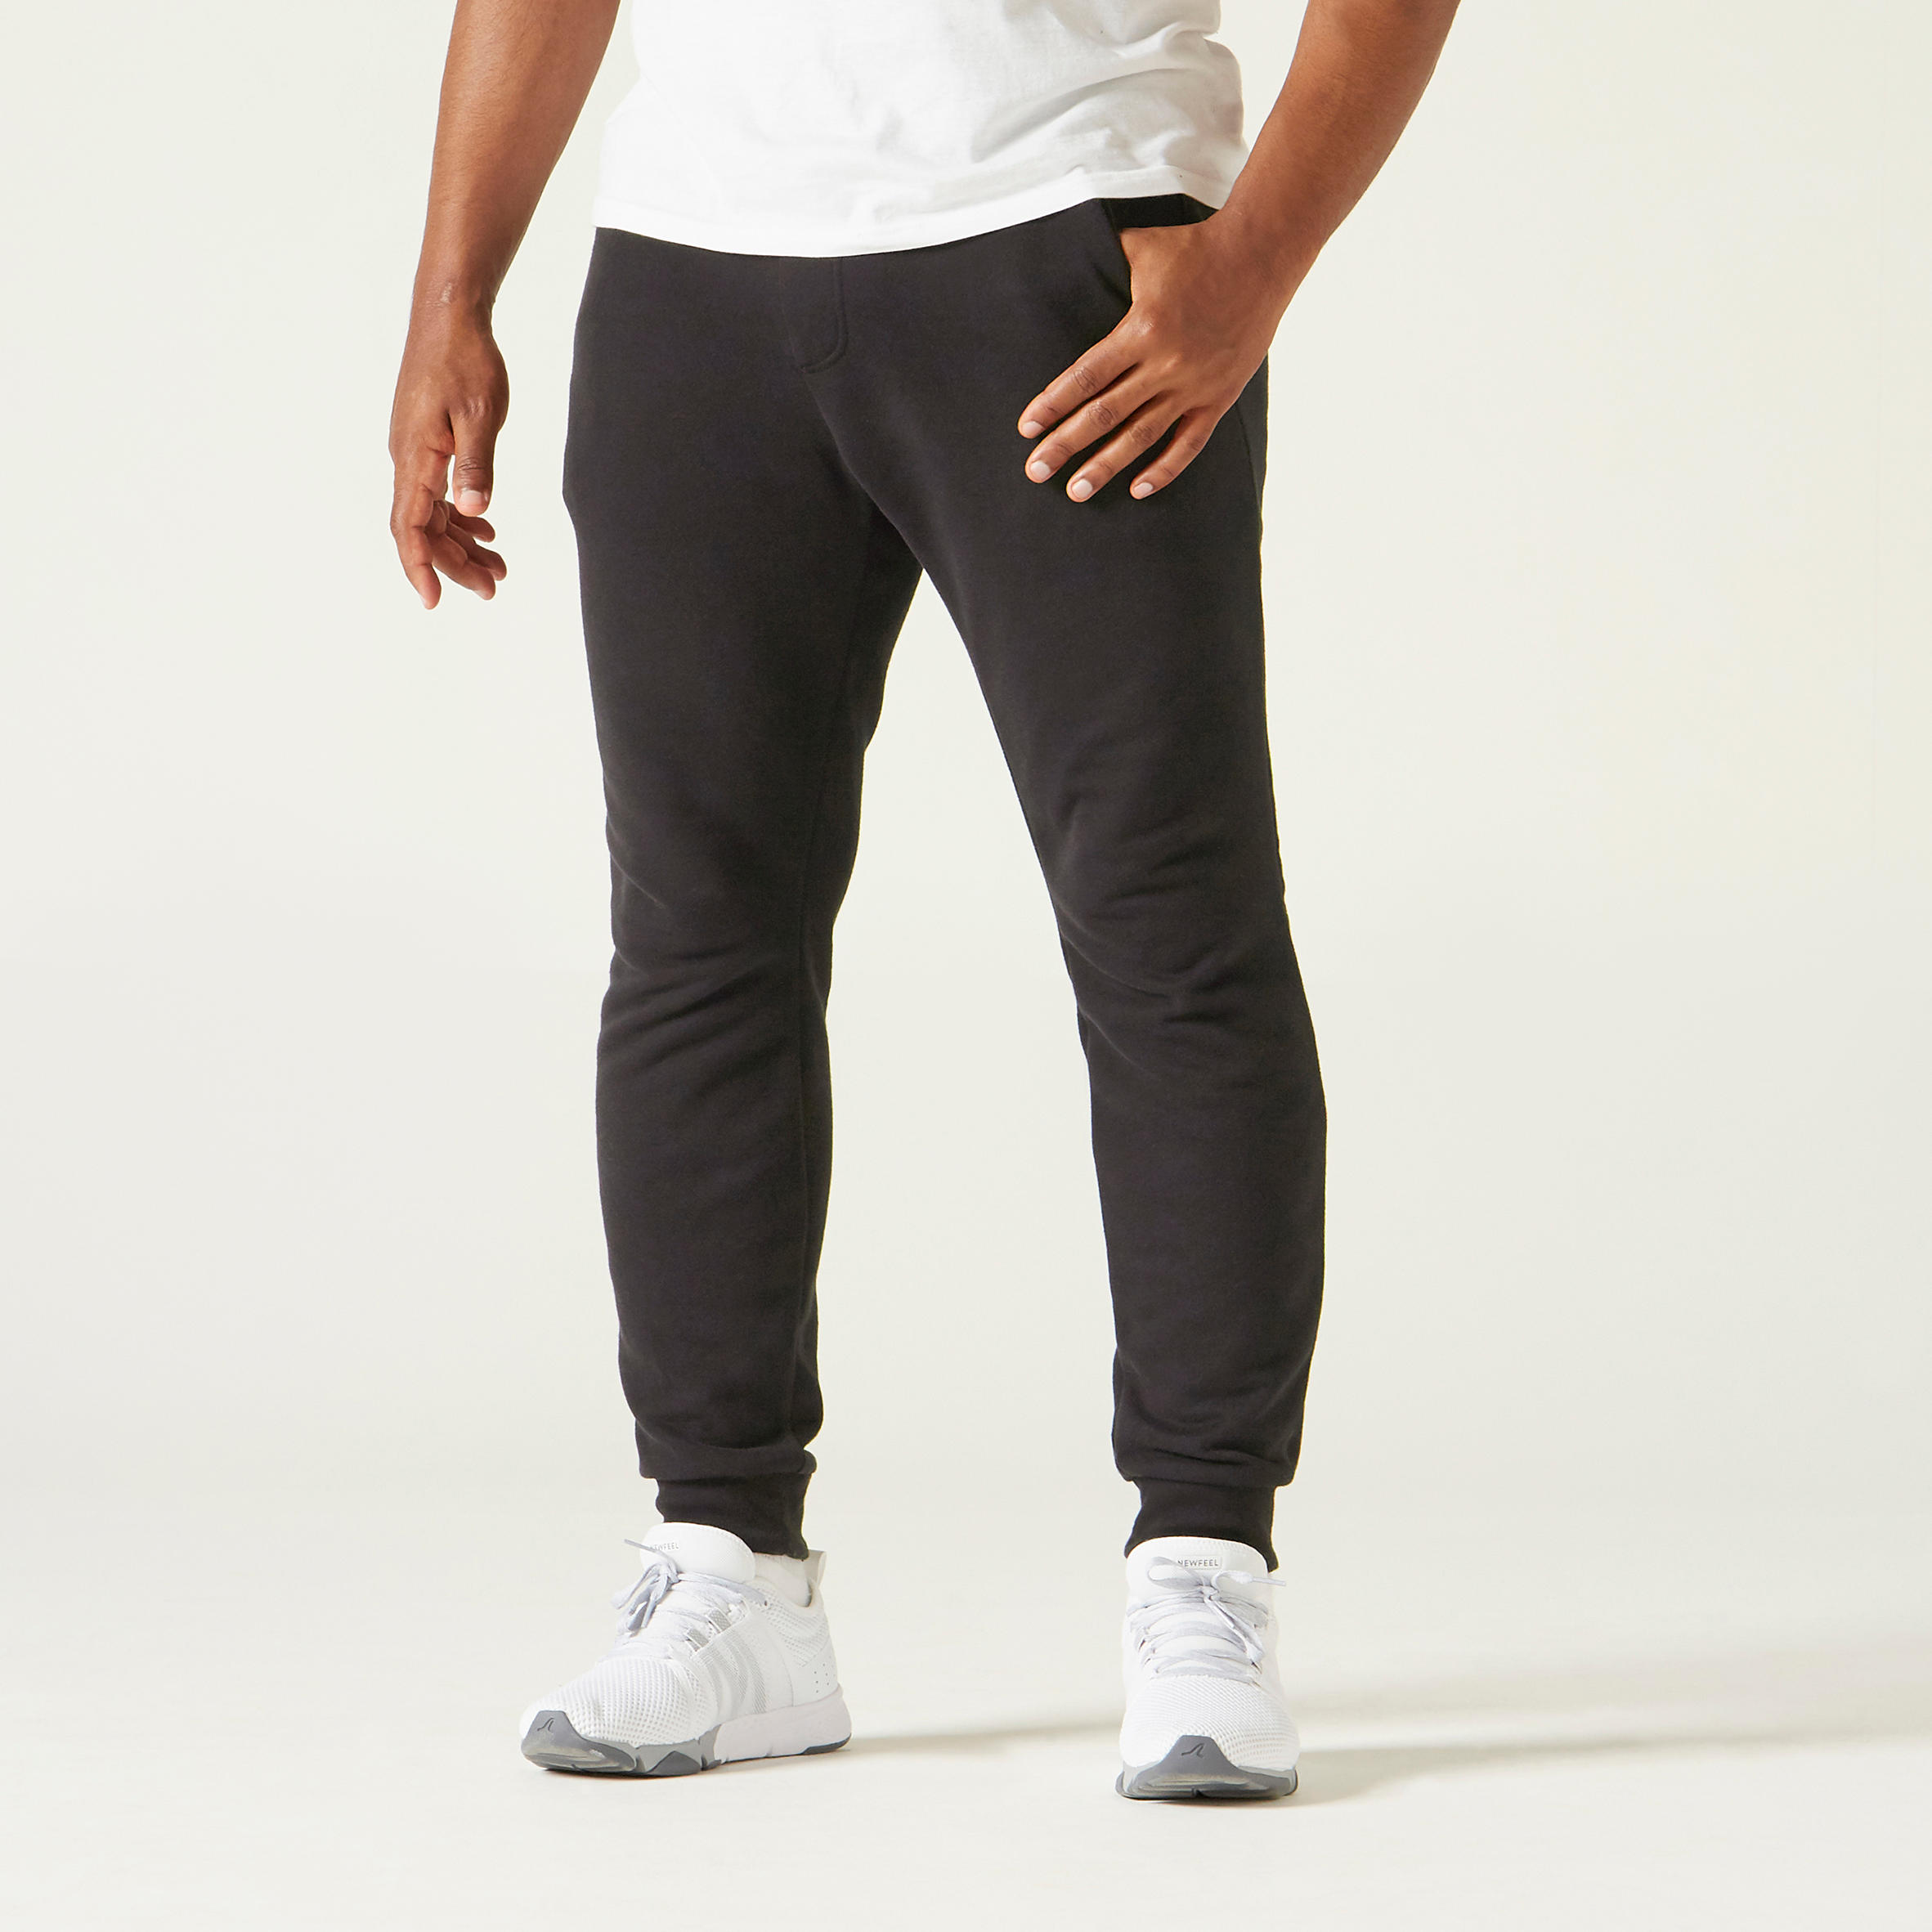 Pantalon slim 500 bărbați imagine